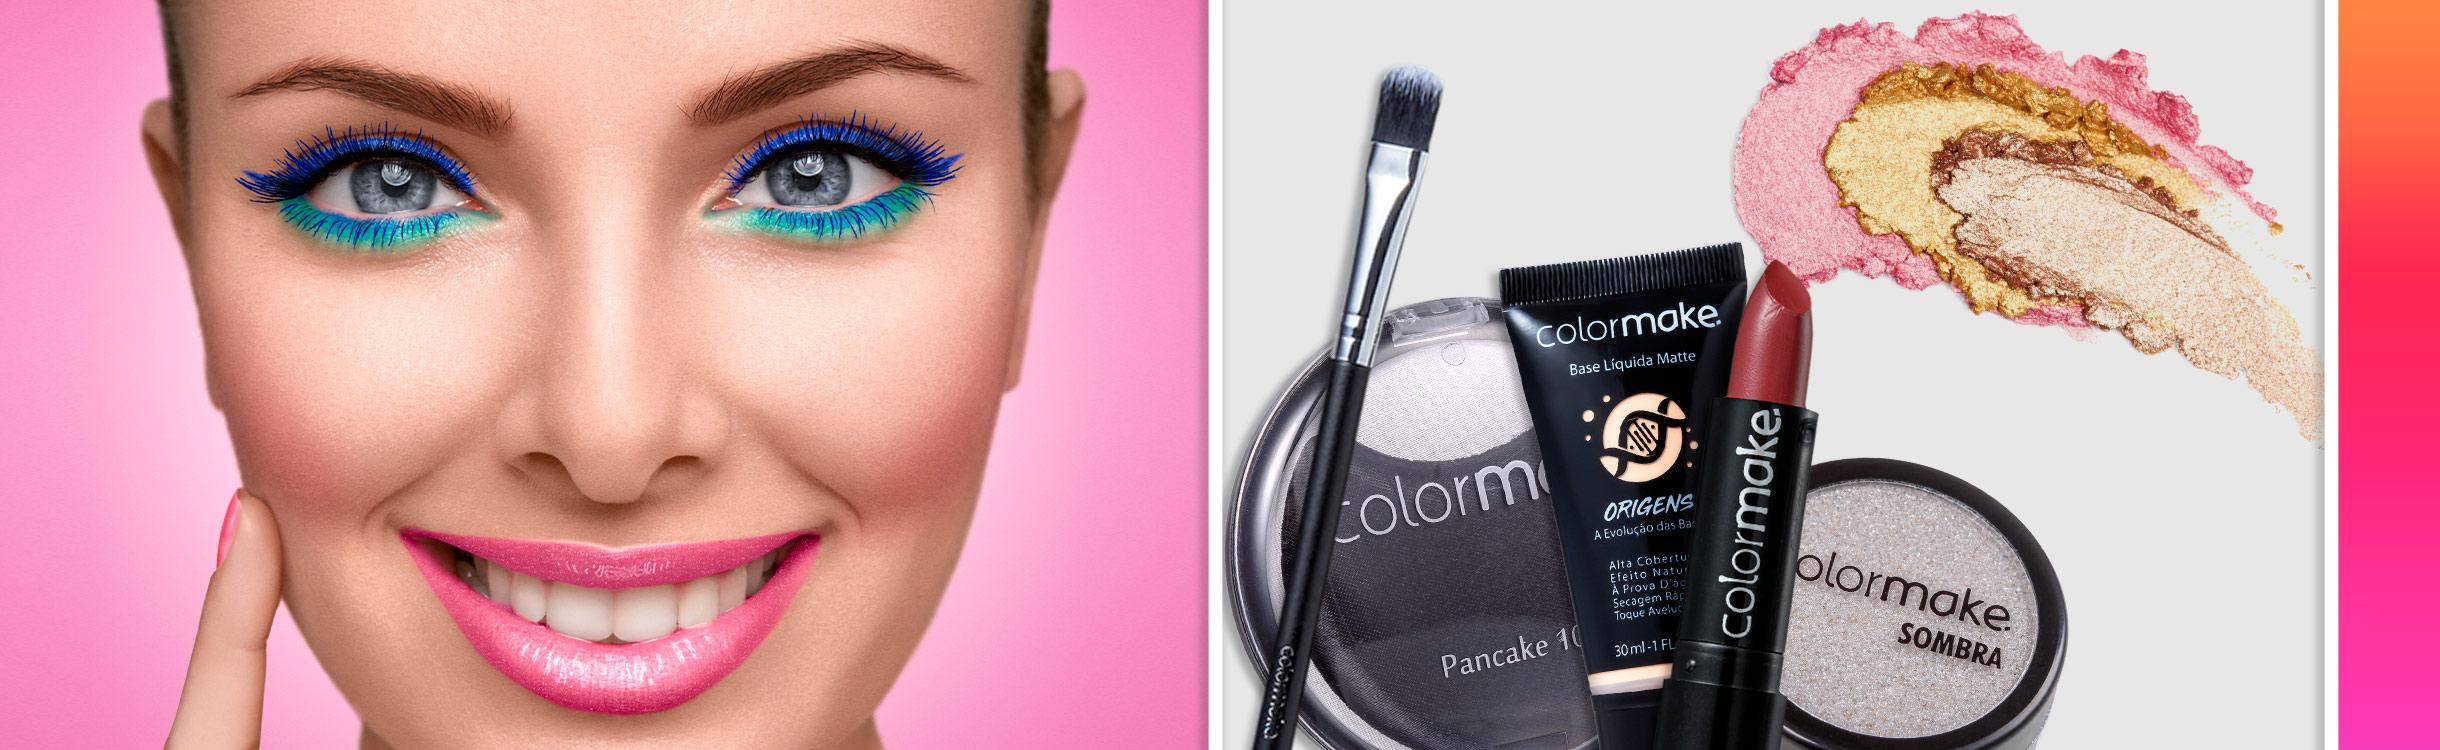 Maquiagem Facial Colormake